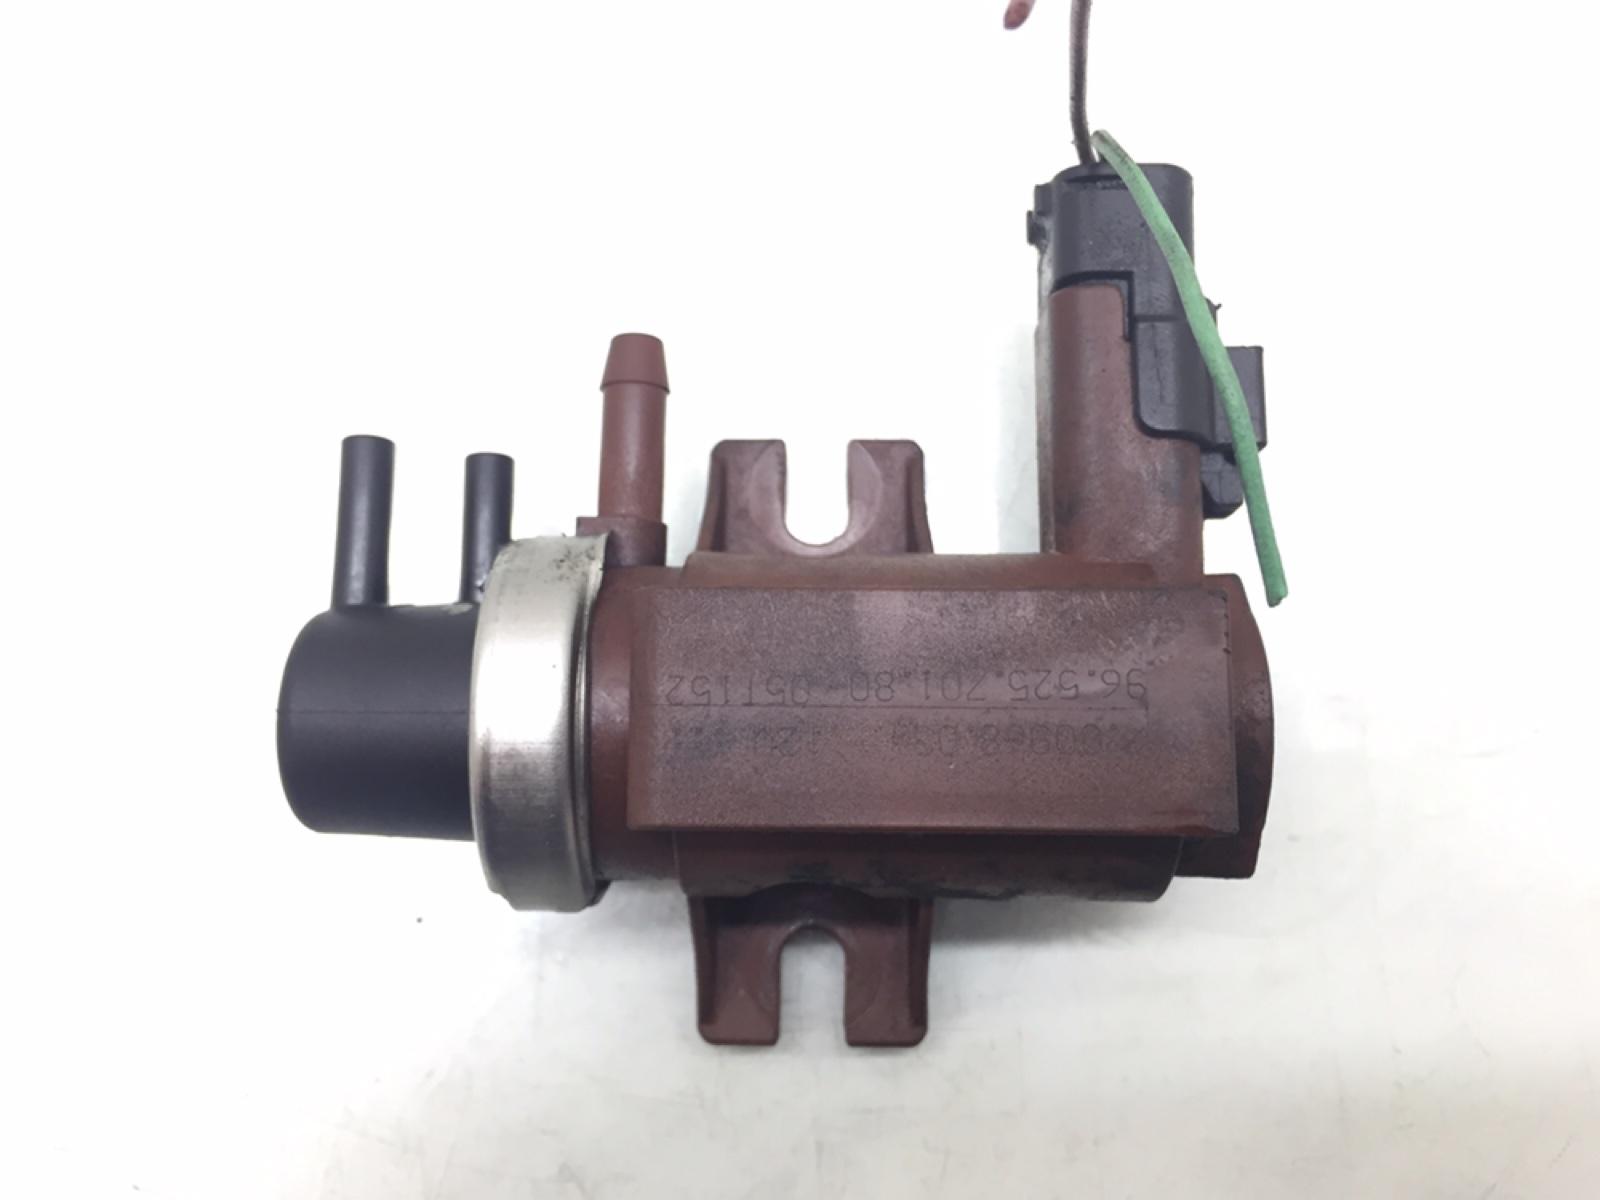 Клапан электромагнитный Peugeot 307 1.6 HDI 2005 (б/у)